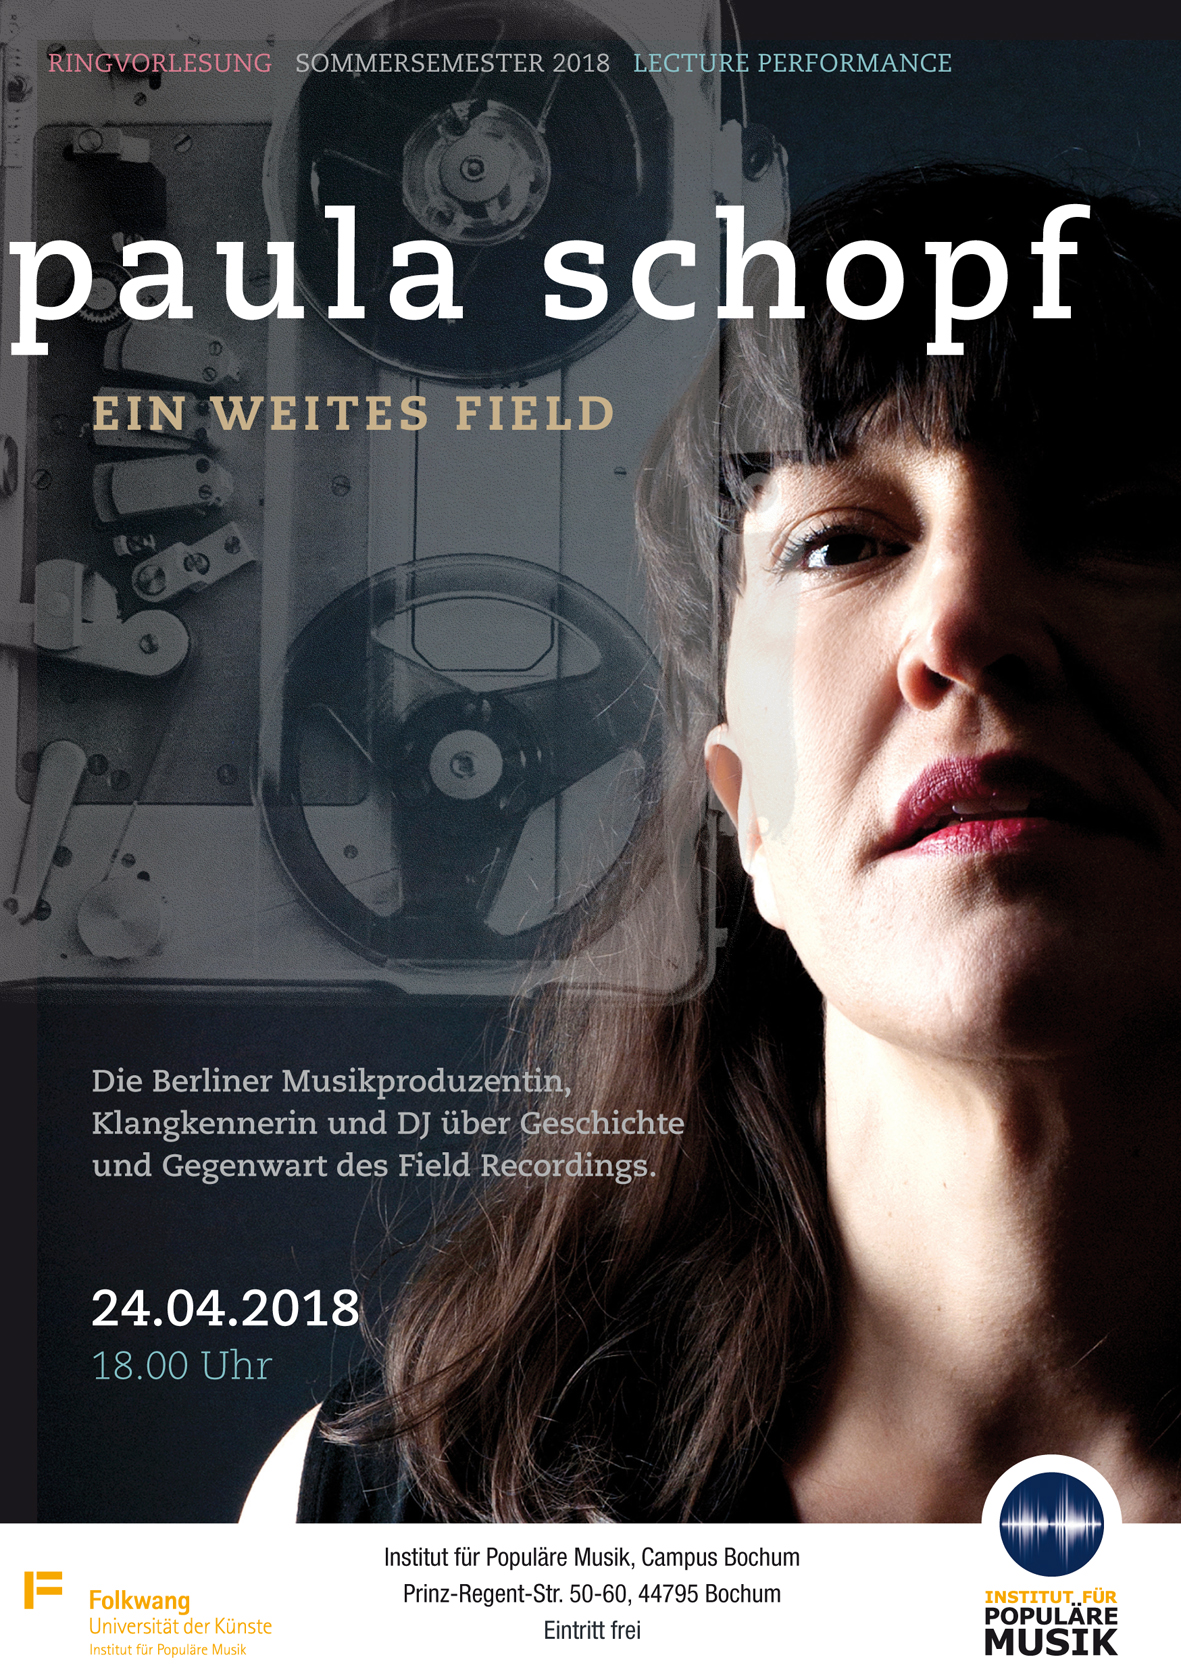 Paula Schopf